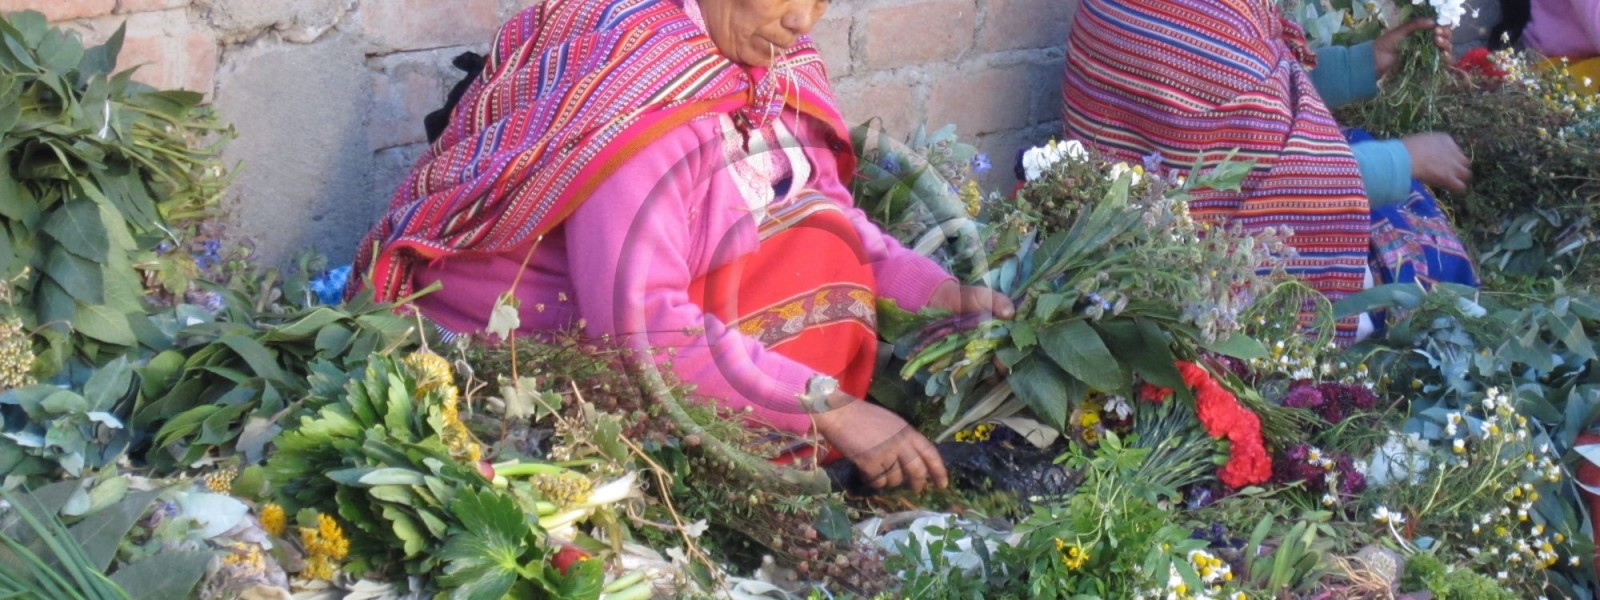 c_marche-challwa-plantes-medicinles-f-canard